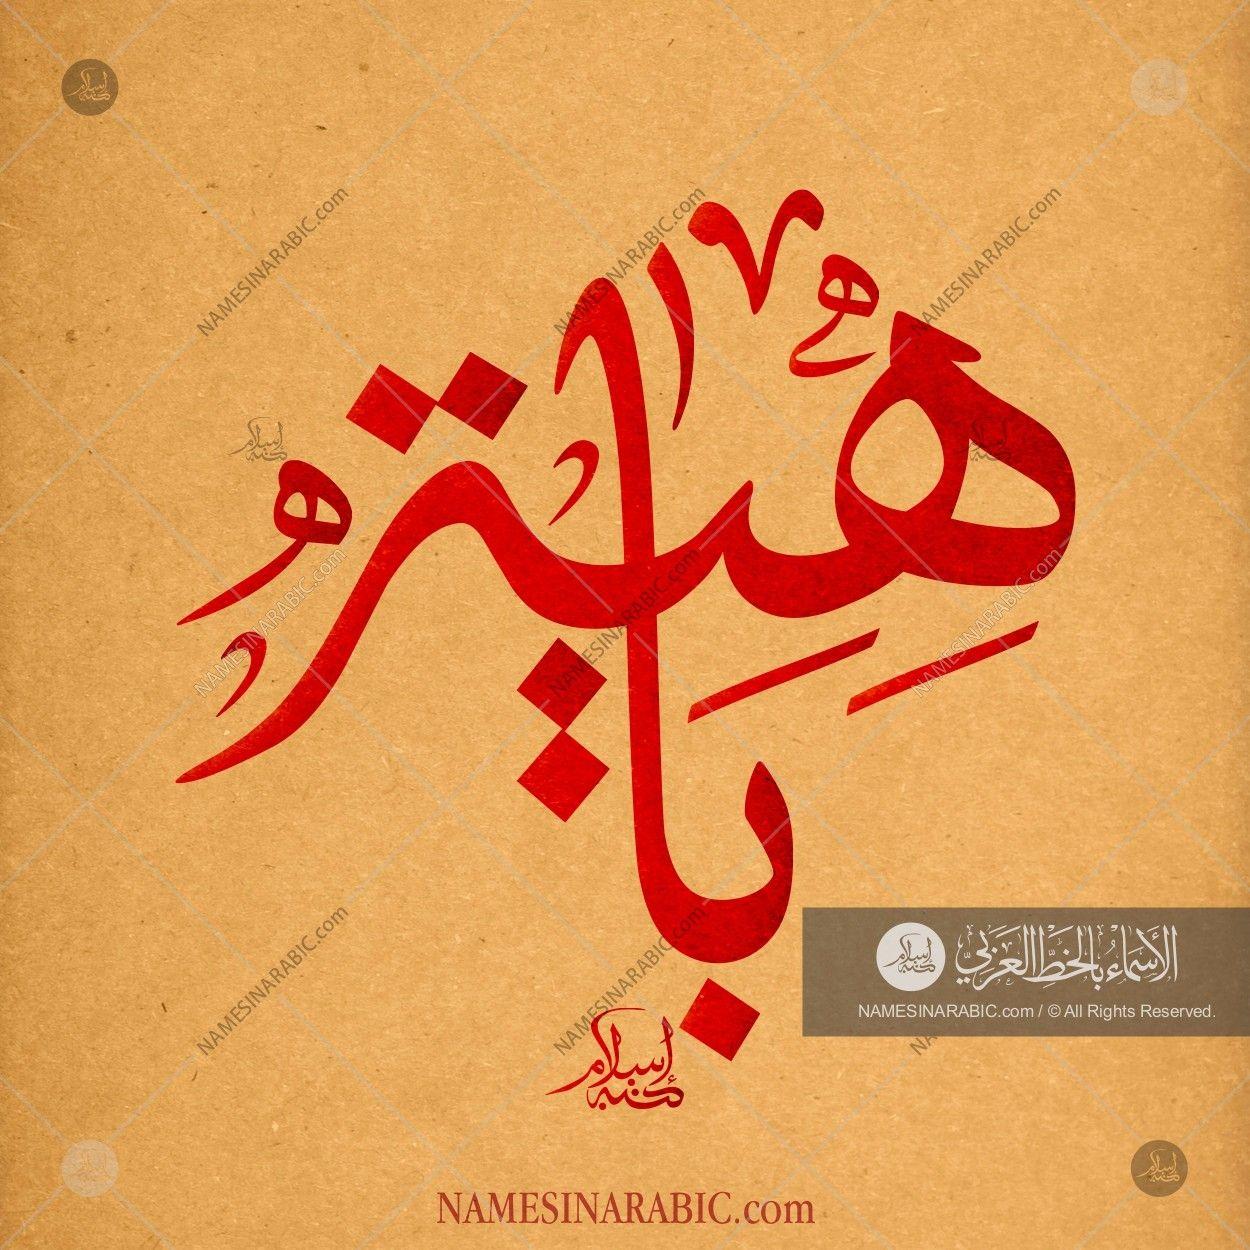 Bahiya باهية Names In Arabic Calligraphy Name 1478 Calligraphy Name Calligraphy Arabic Calligraphy Art